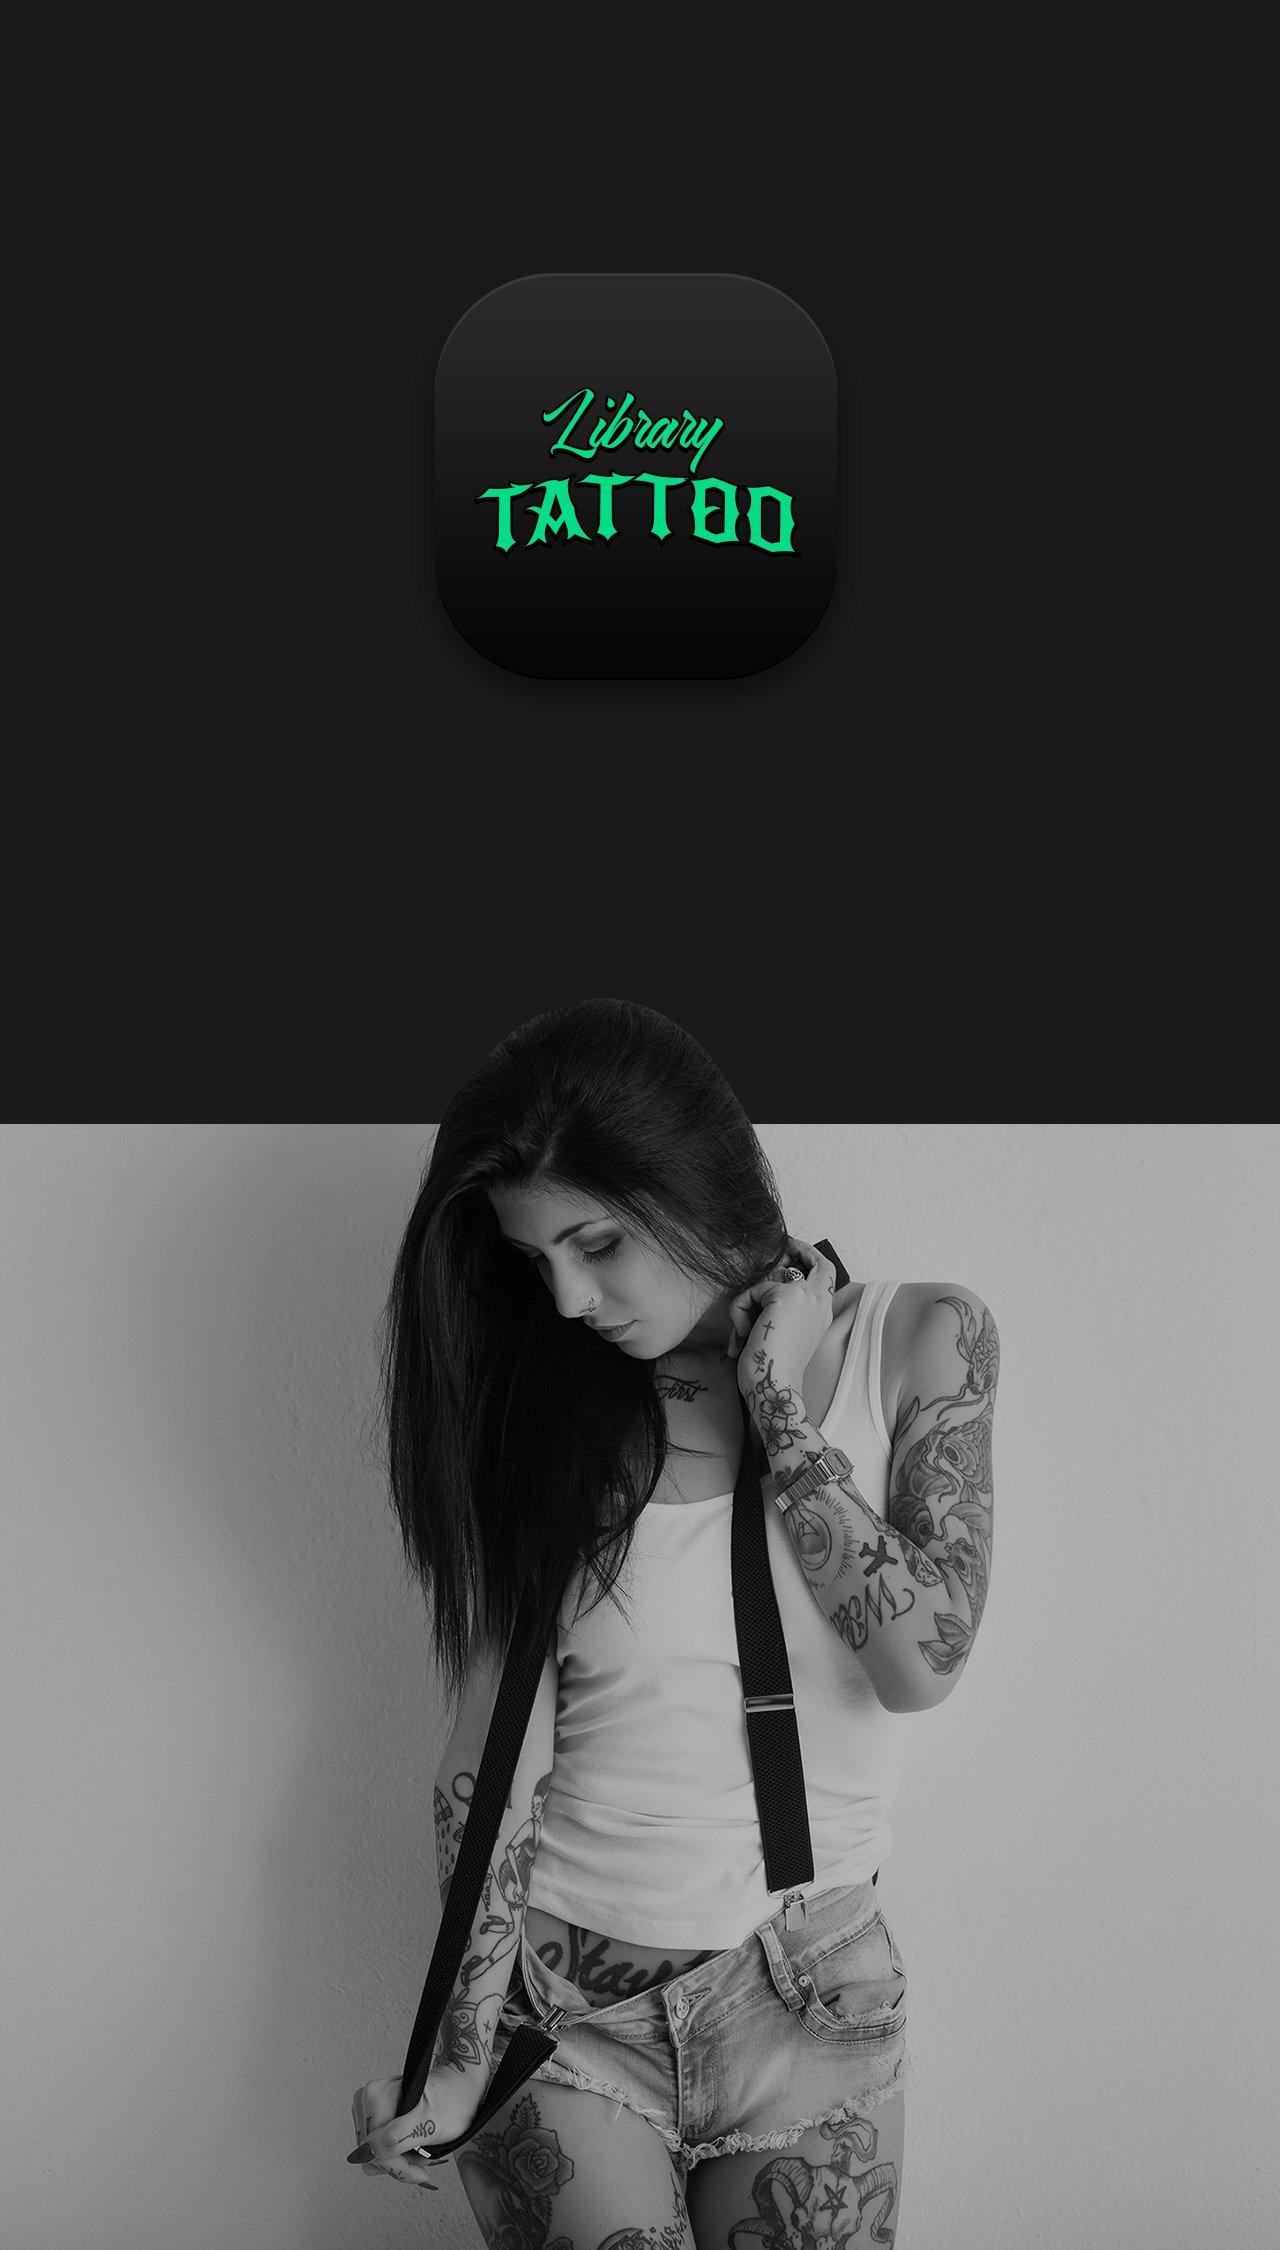 Library_tattoo-03